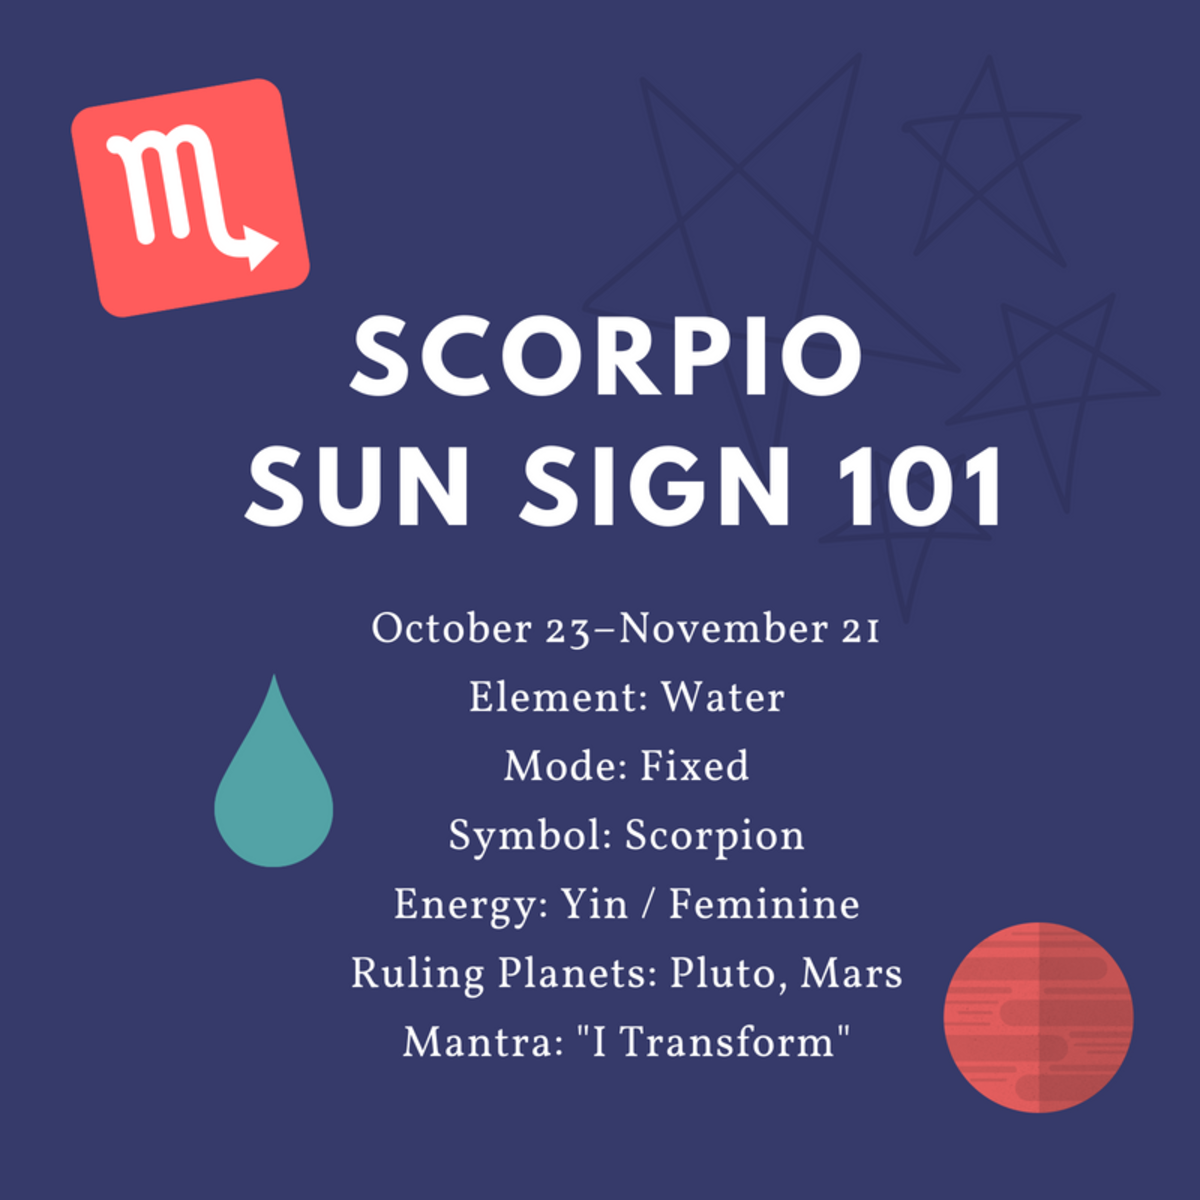 Scorpio is a fixed, feminine, water sign.